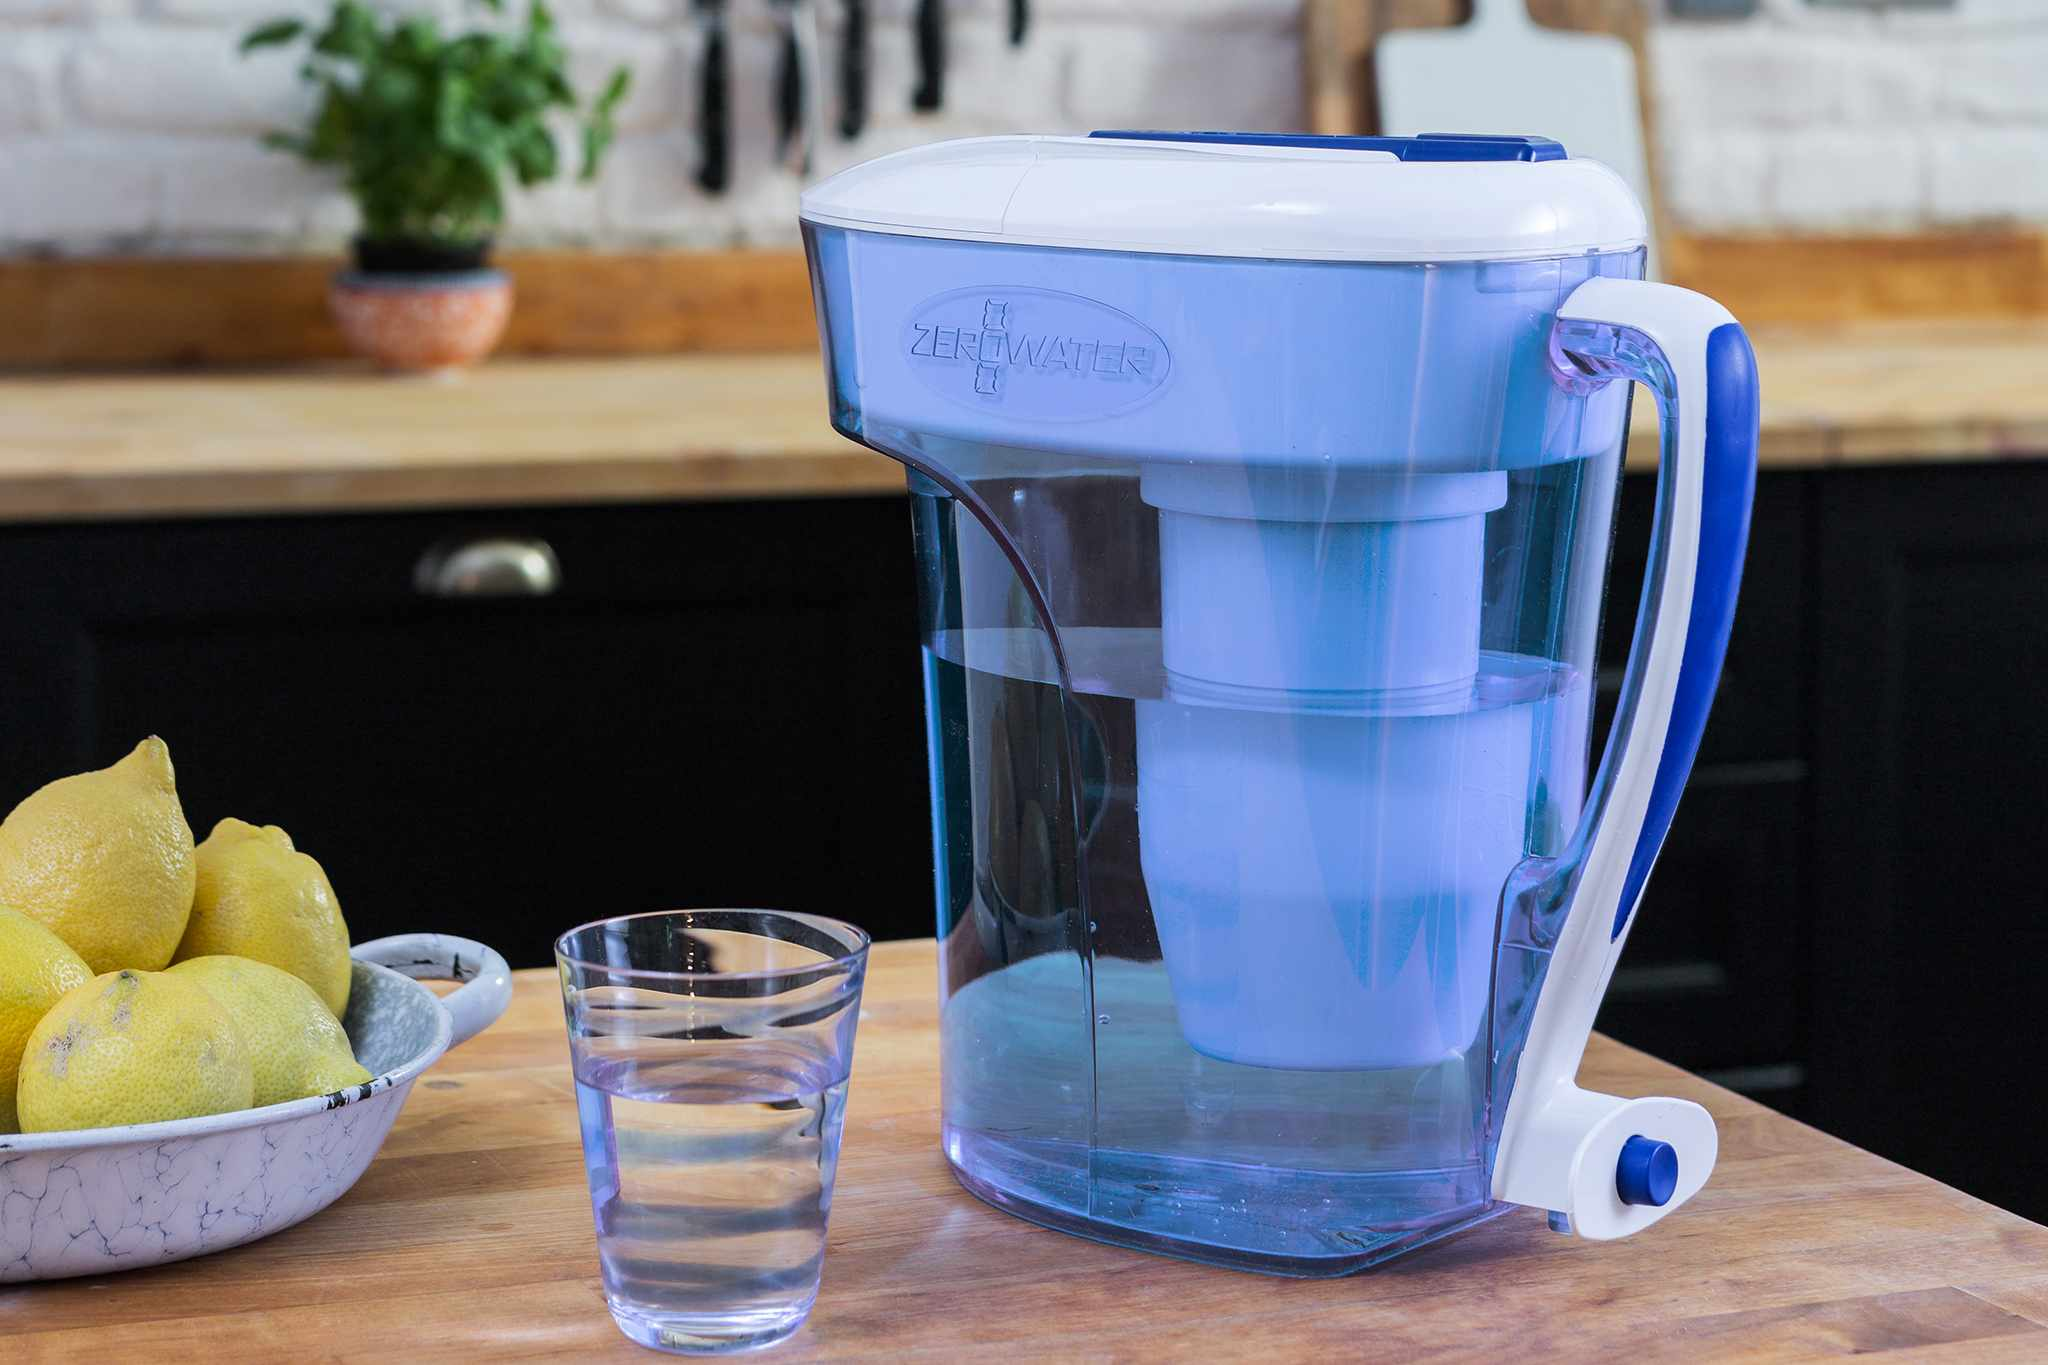 2tech-zerowater-save-20-per-cent-free-pandp-2048-1365